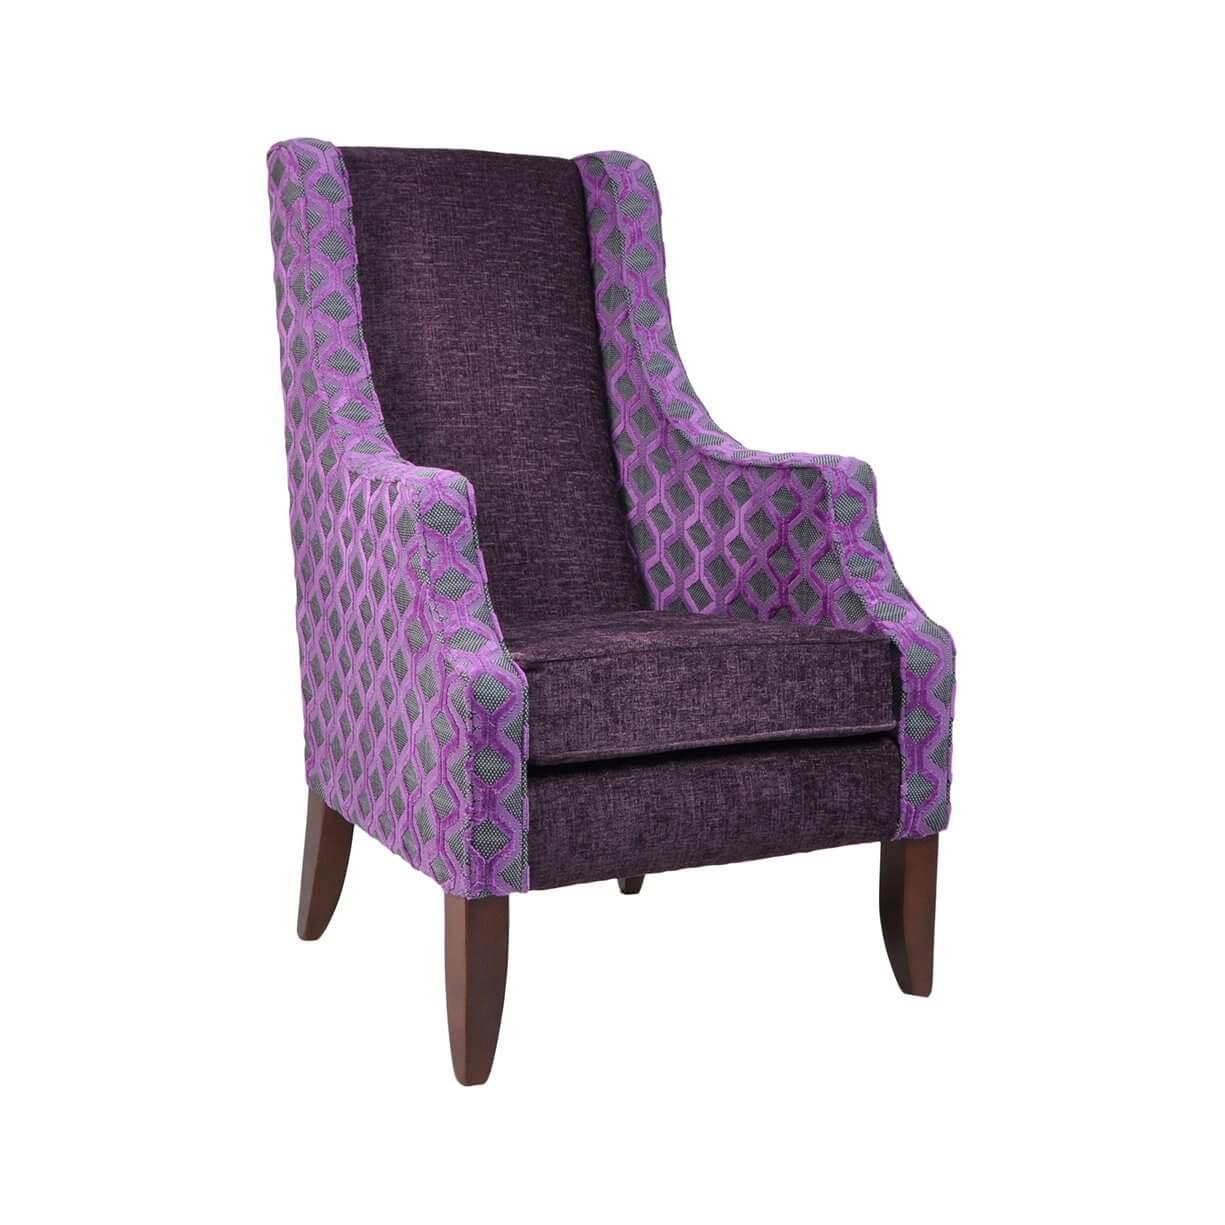 Pandora High Back Chair